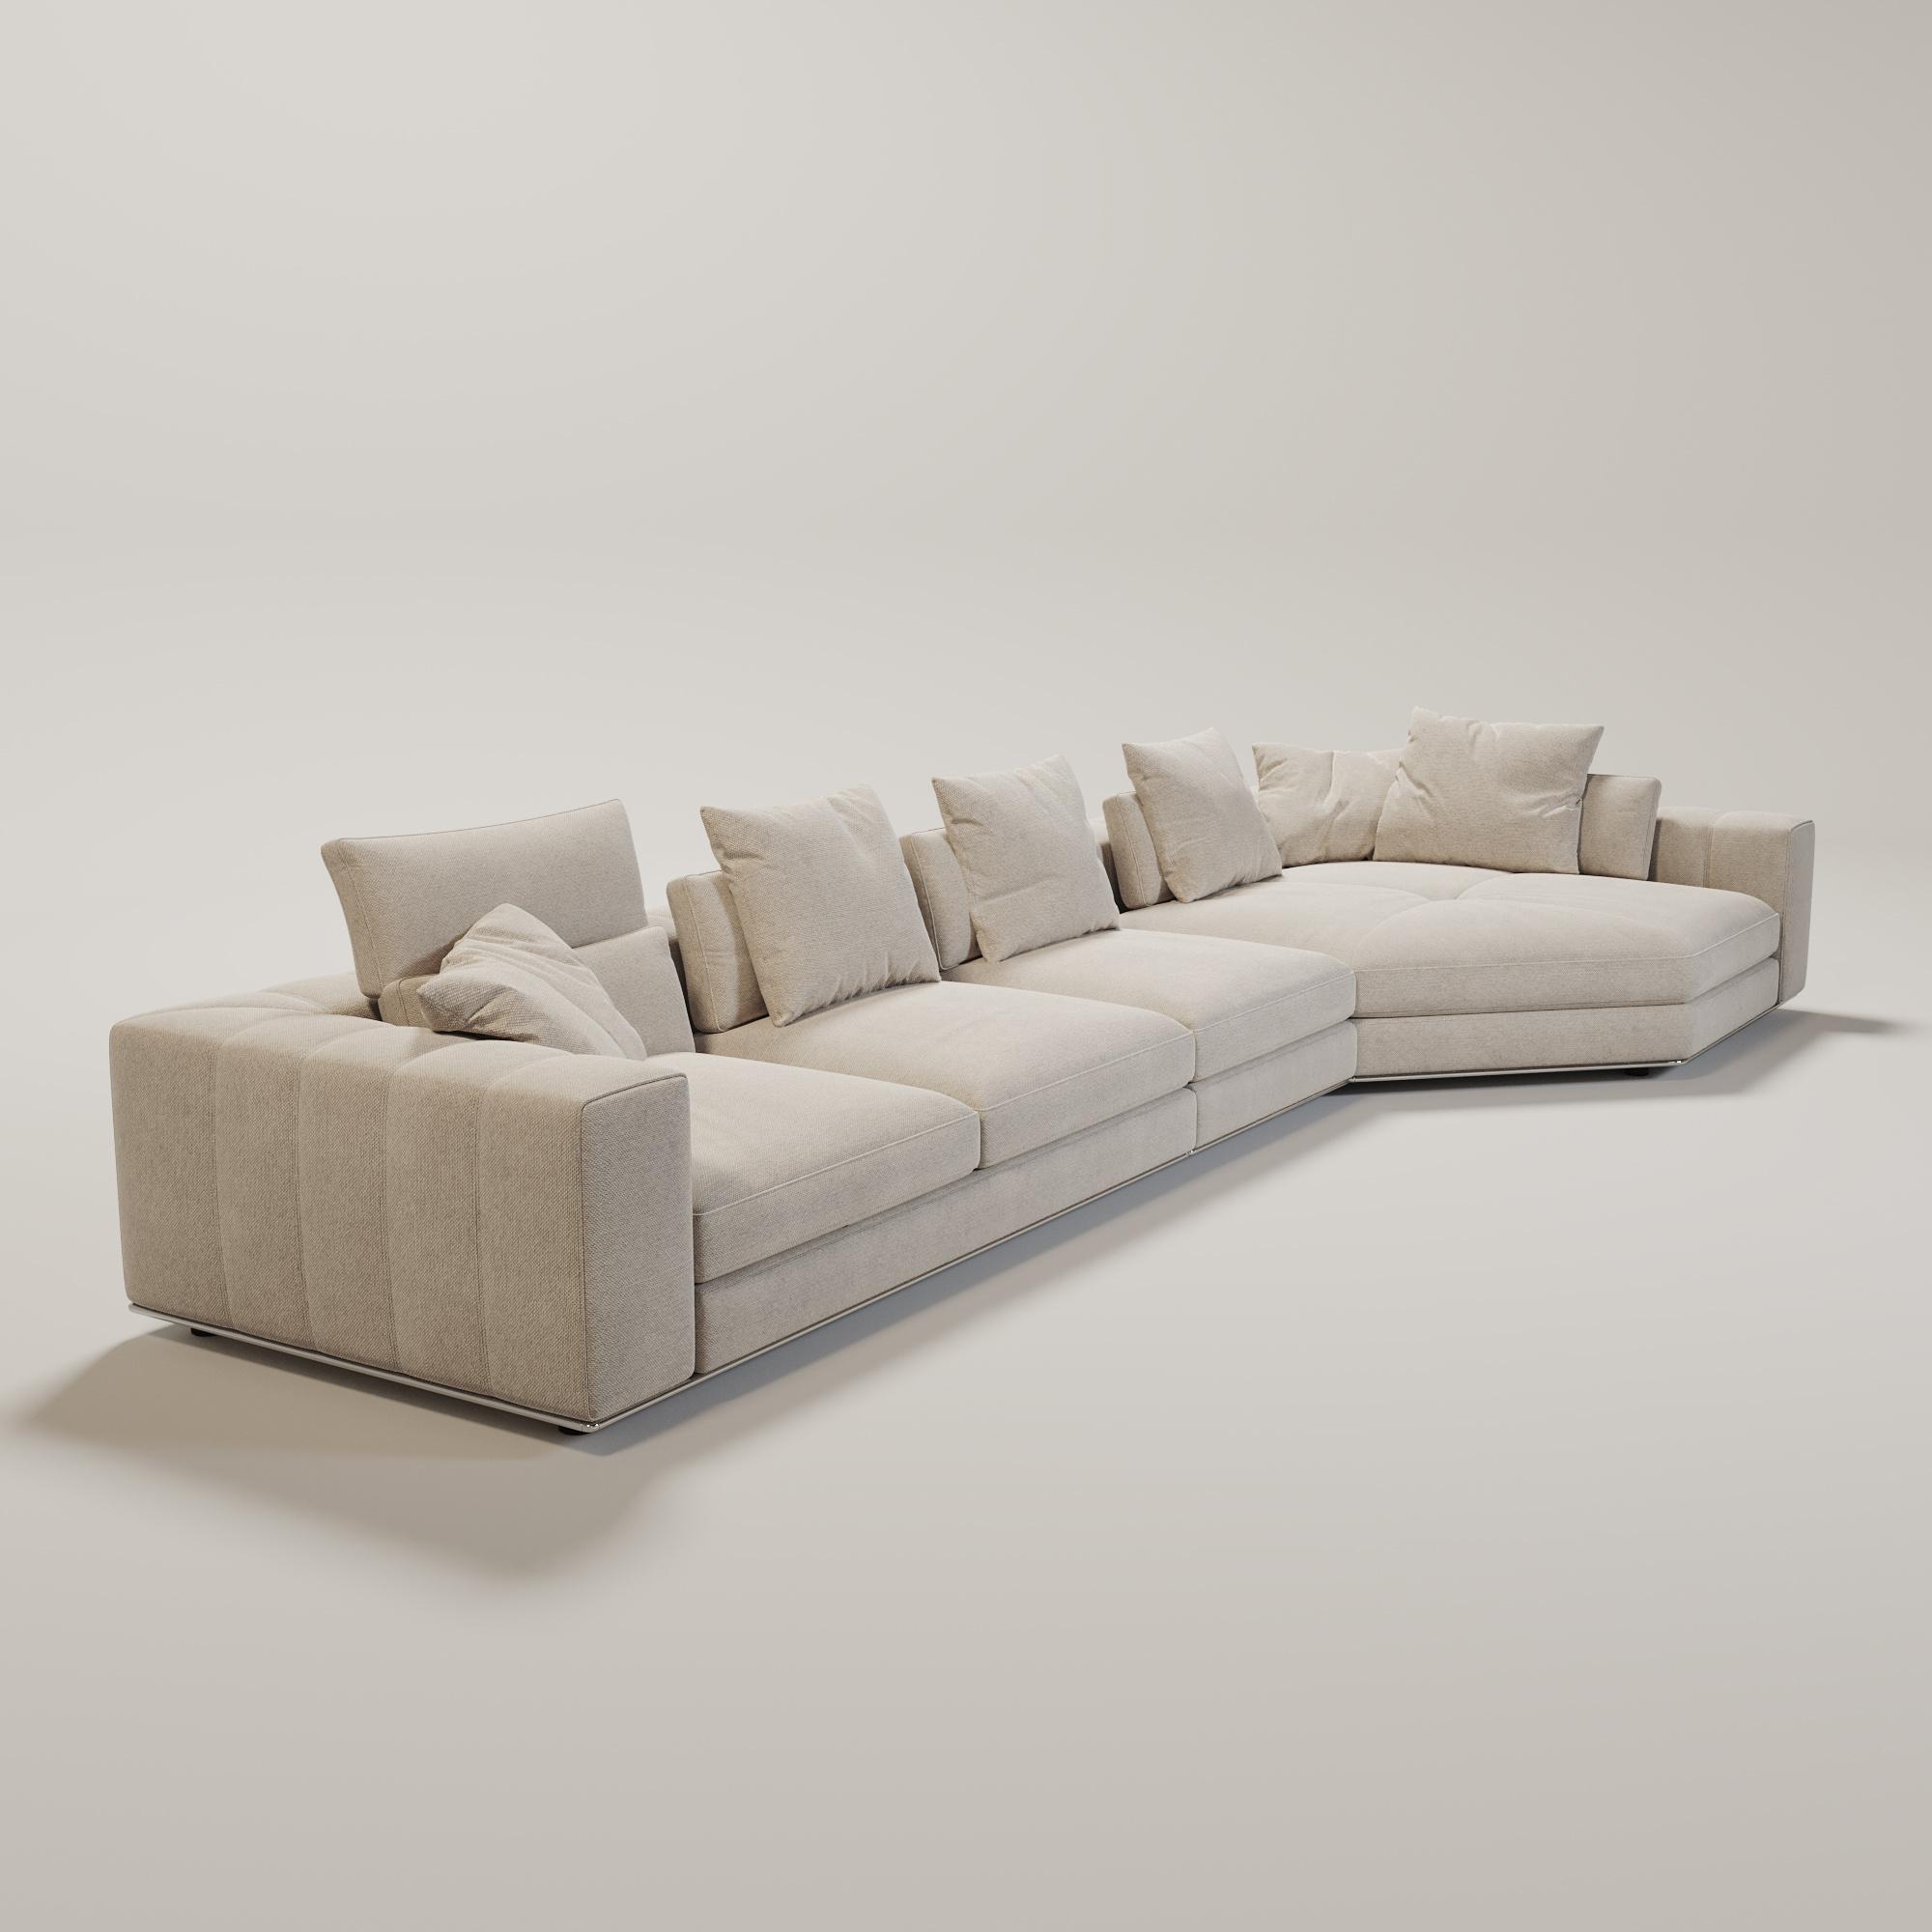 VENICE  Sofa Beige Canvas weave fabric-1